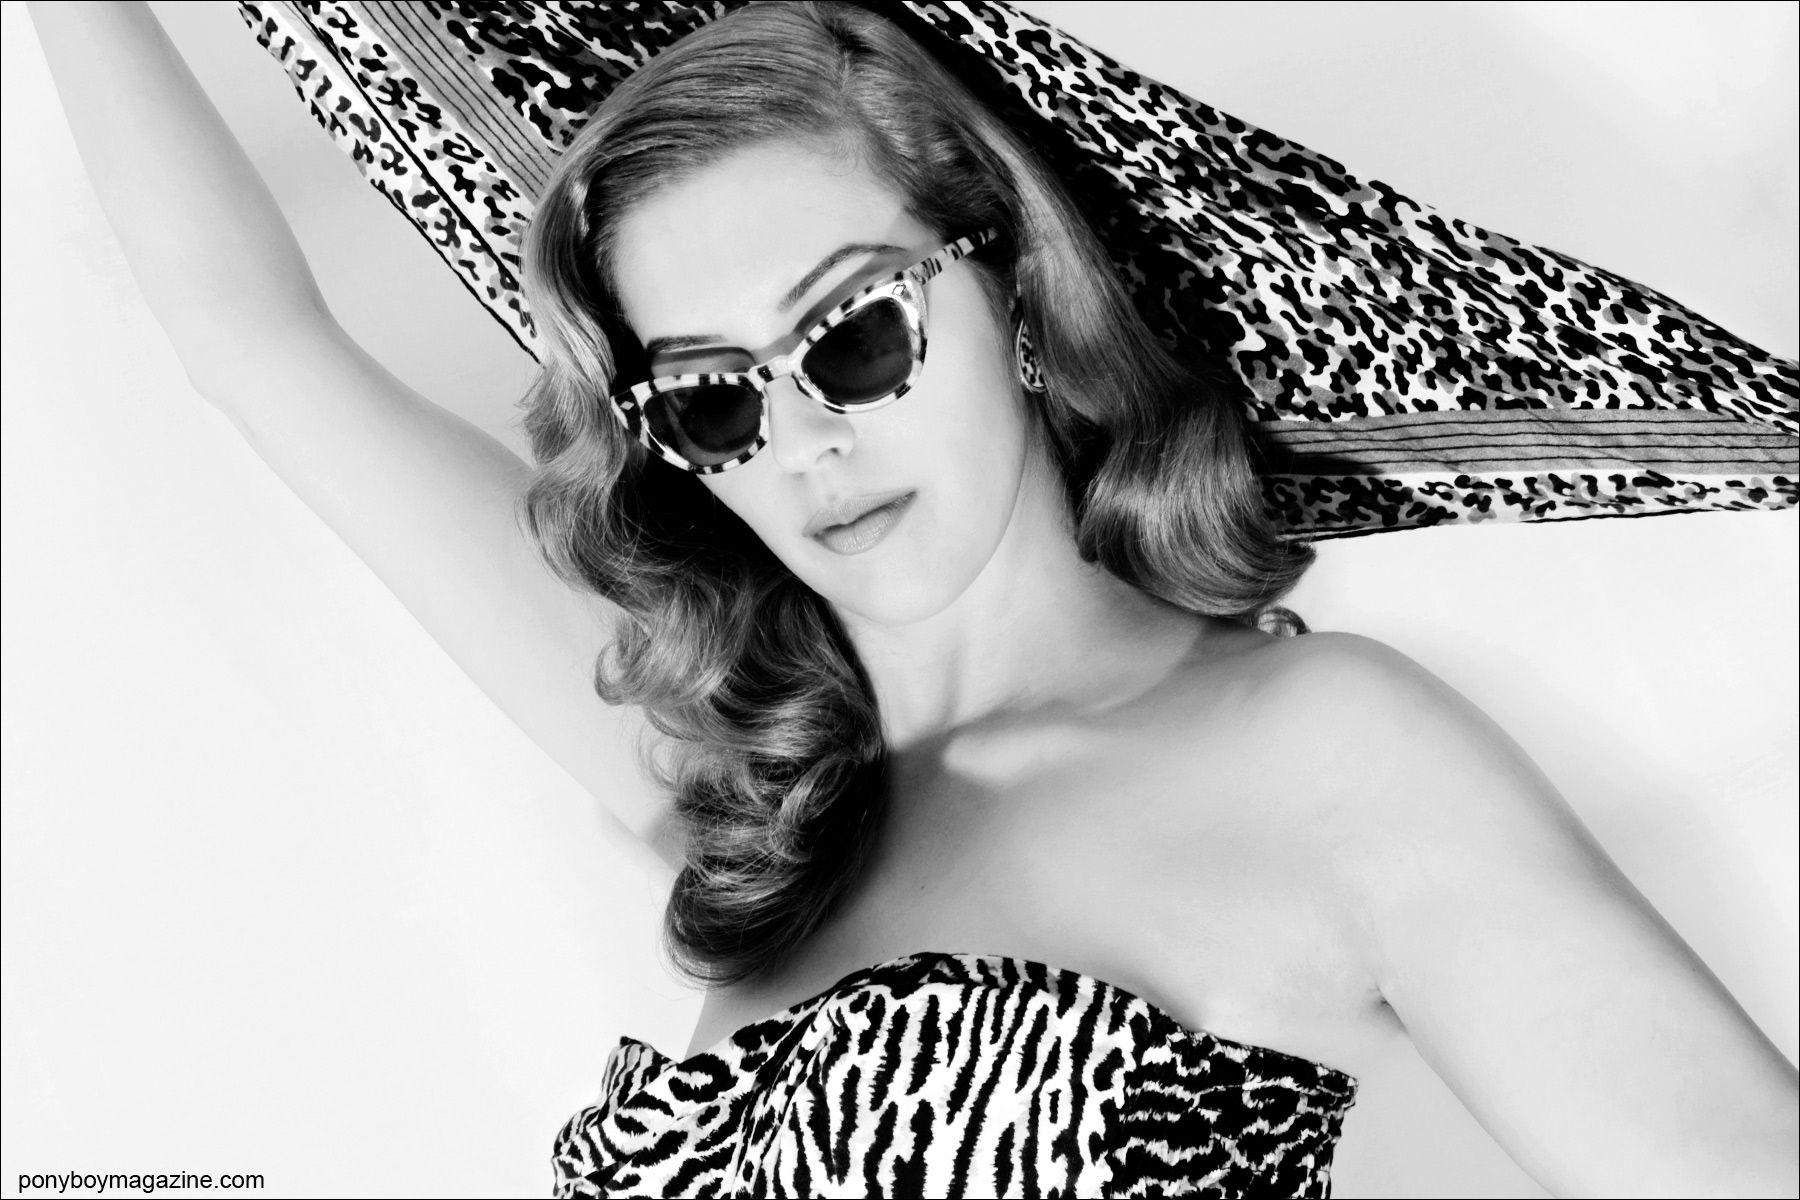 Lingerie designer Lola Devlin wears vintage leopard for Ponyboy Magazine, photographed by Alexander Thompson.